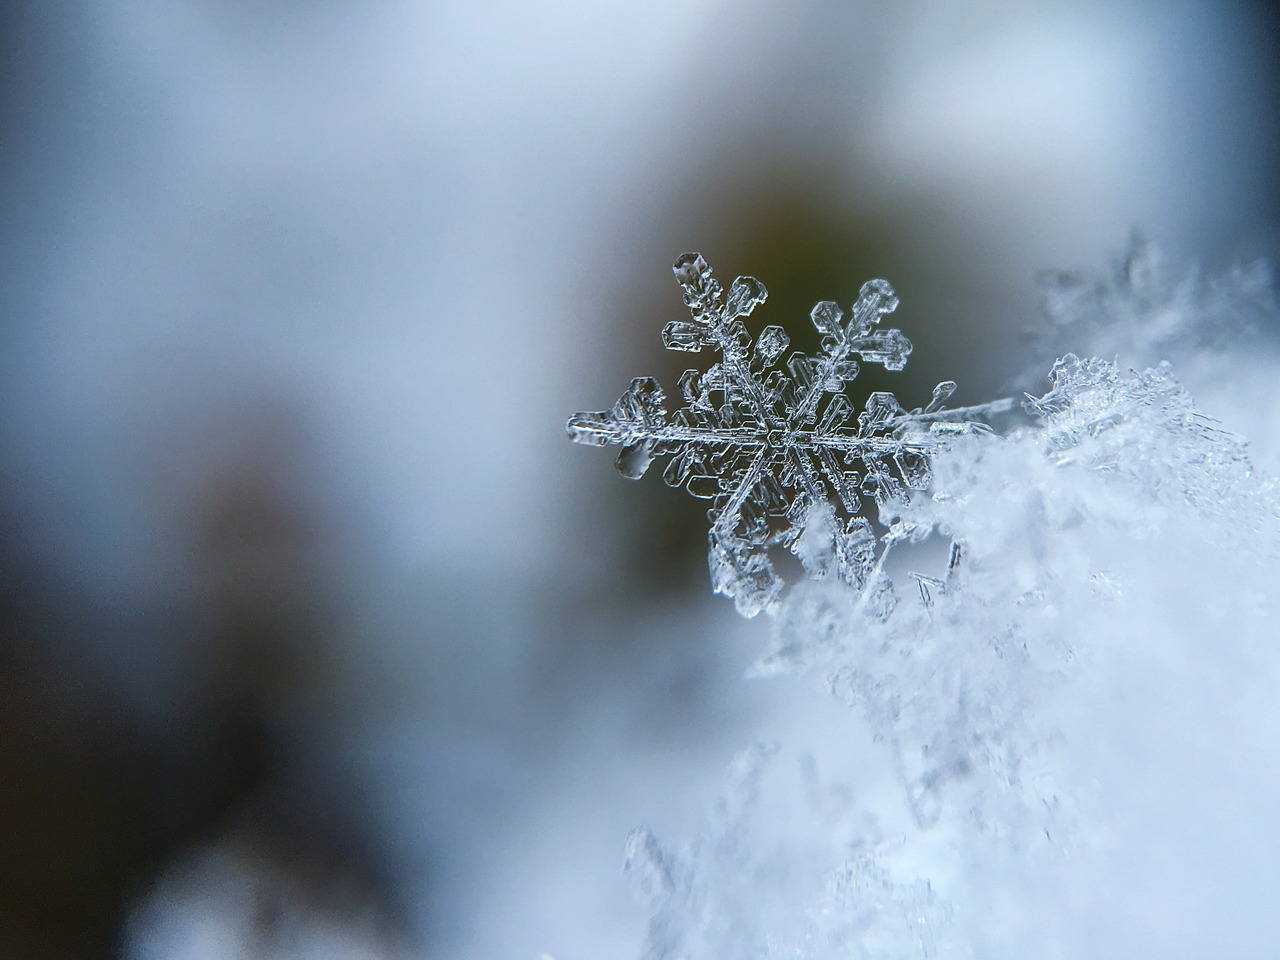 Make sure you come to Toronto to appreciate winter in Toronto